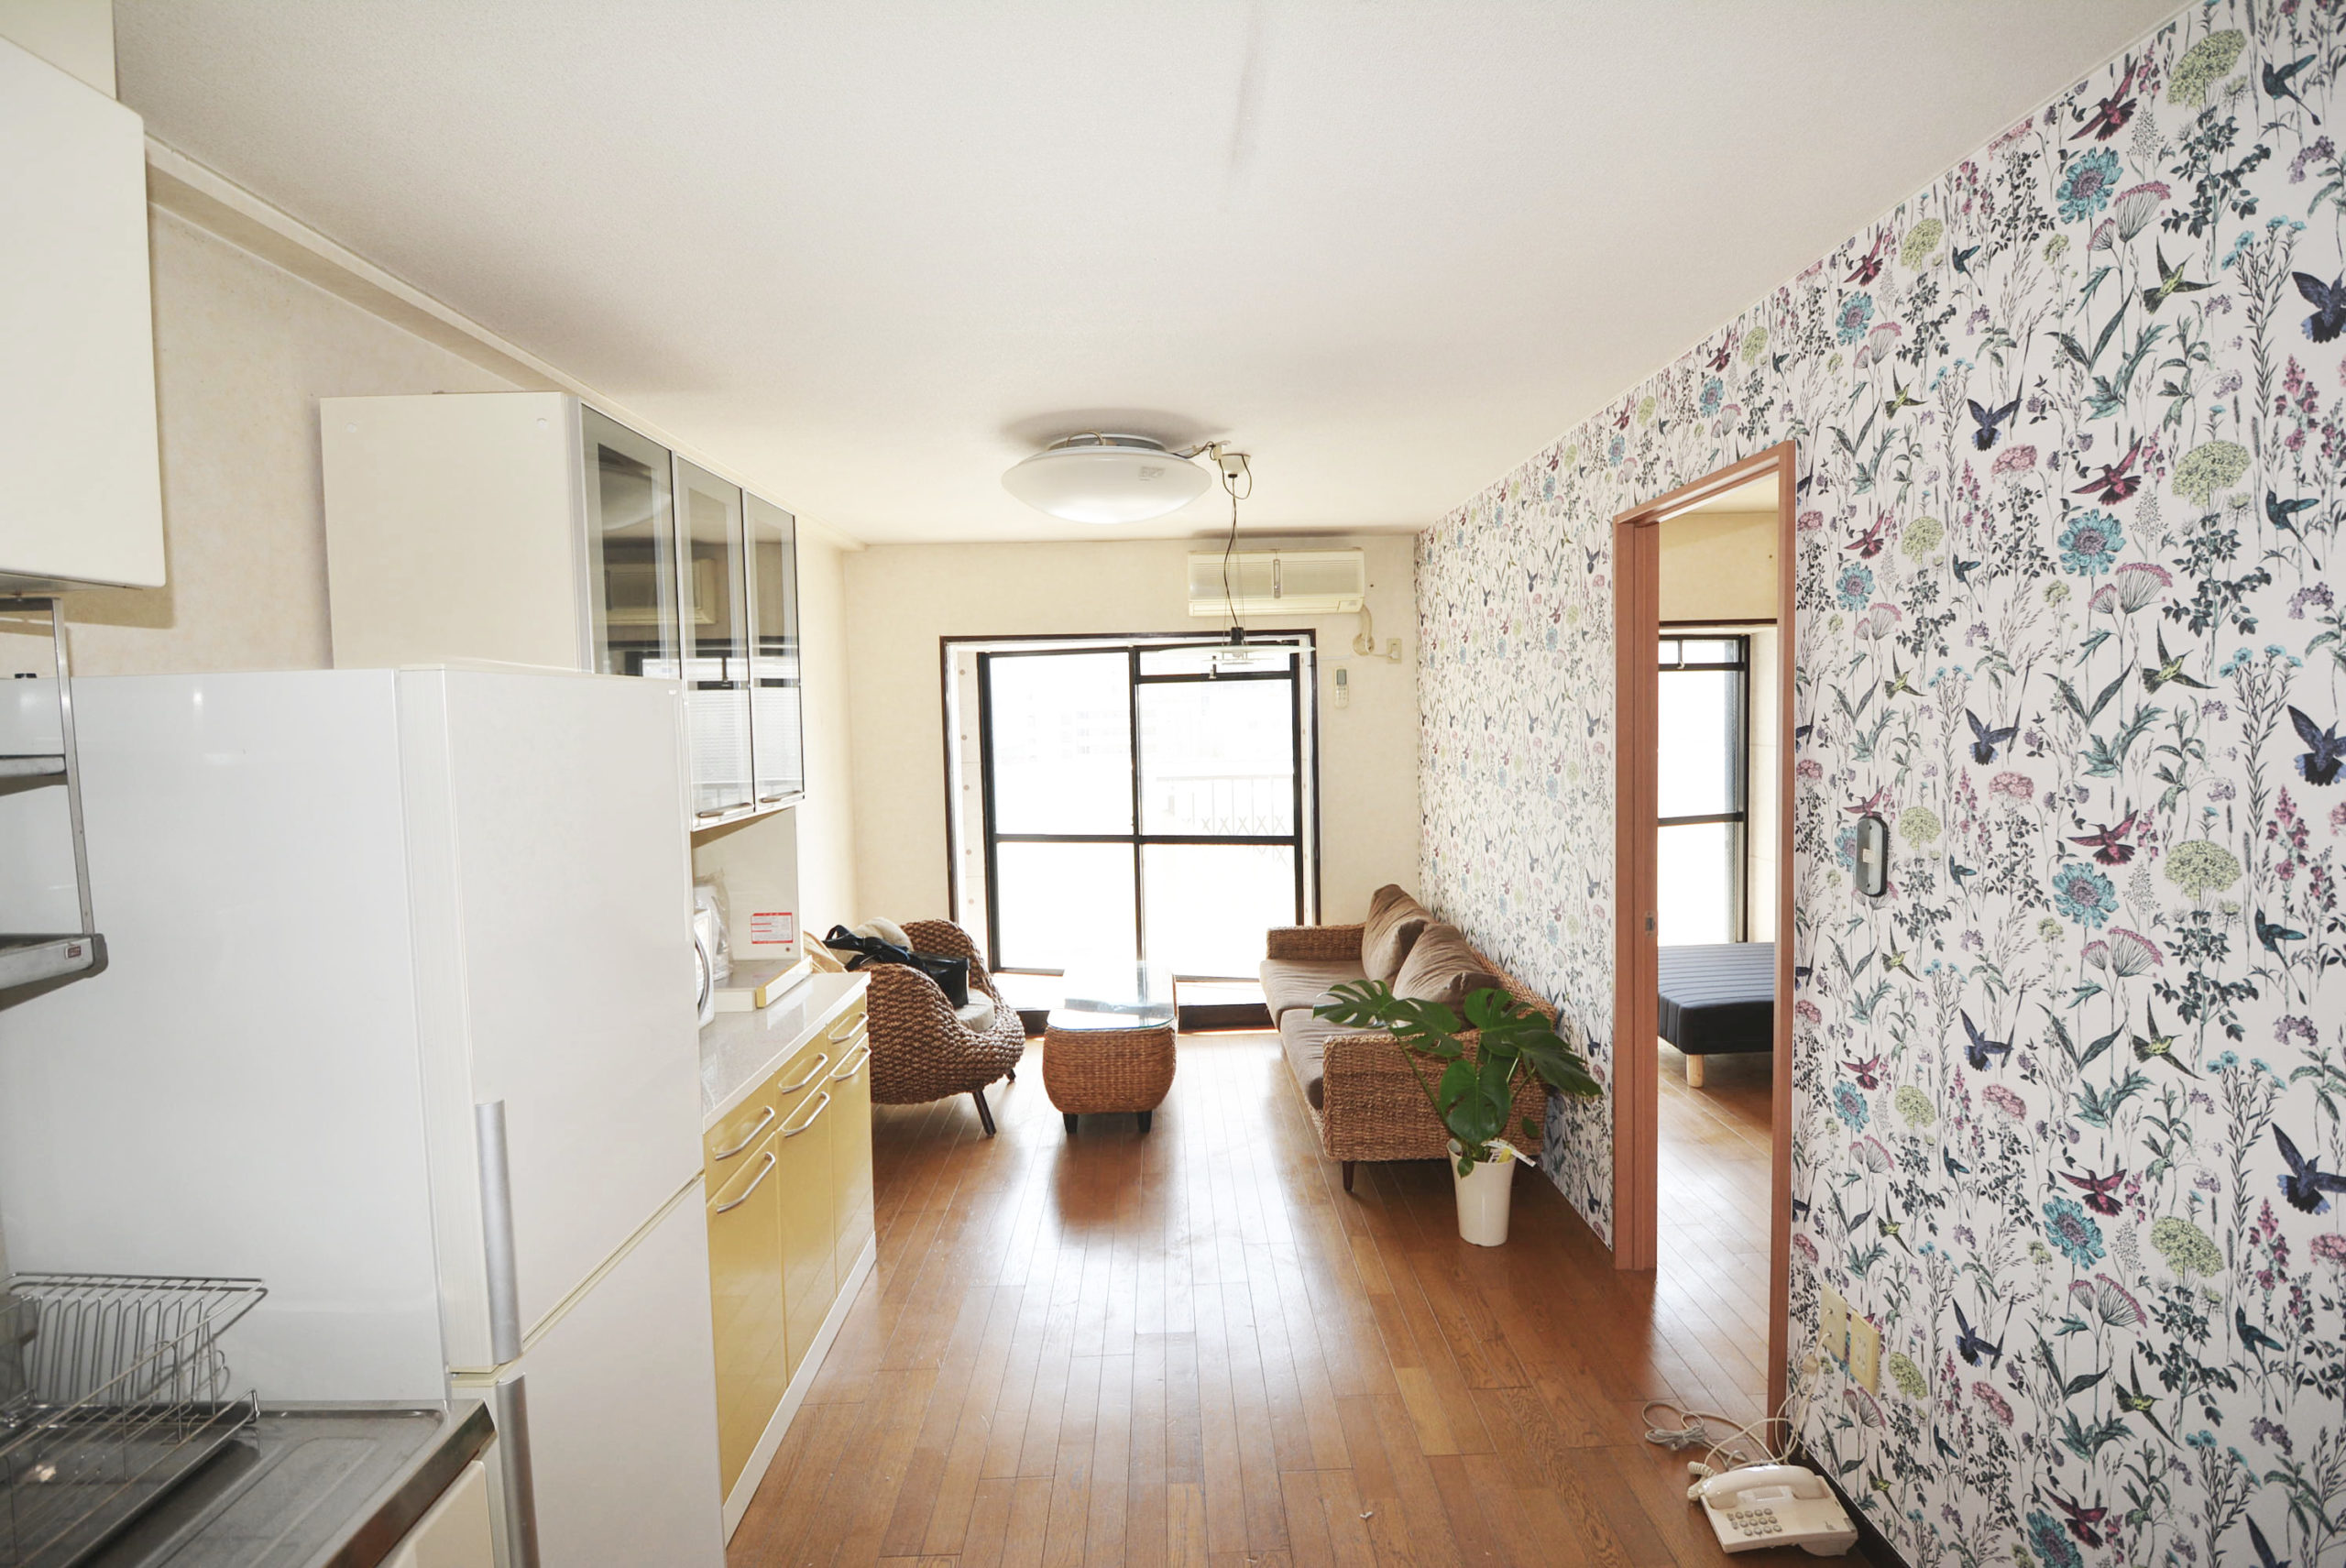 Kamimaezu house